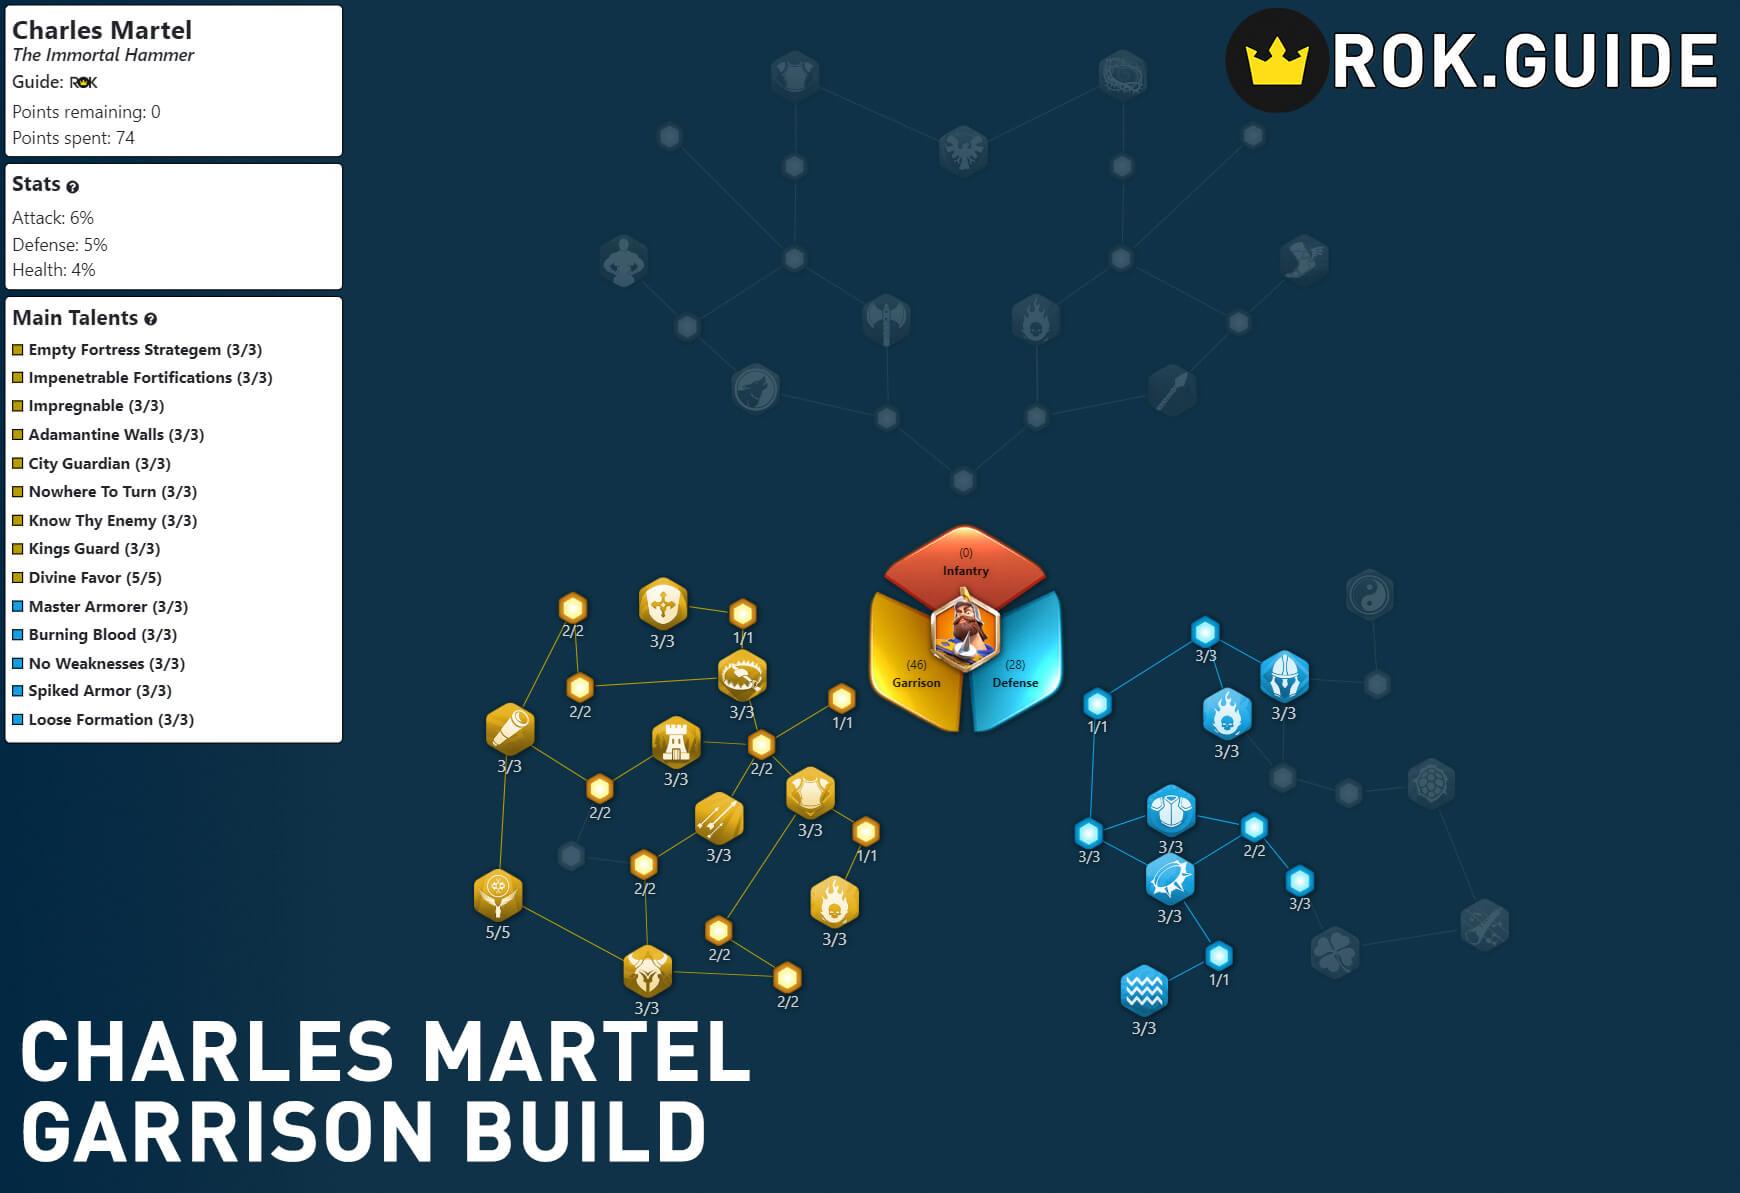 charles martel garrison build